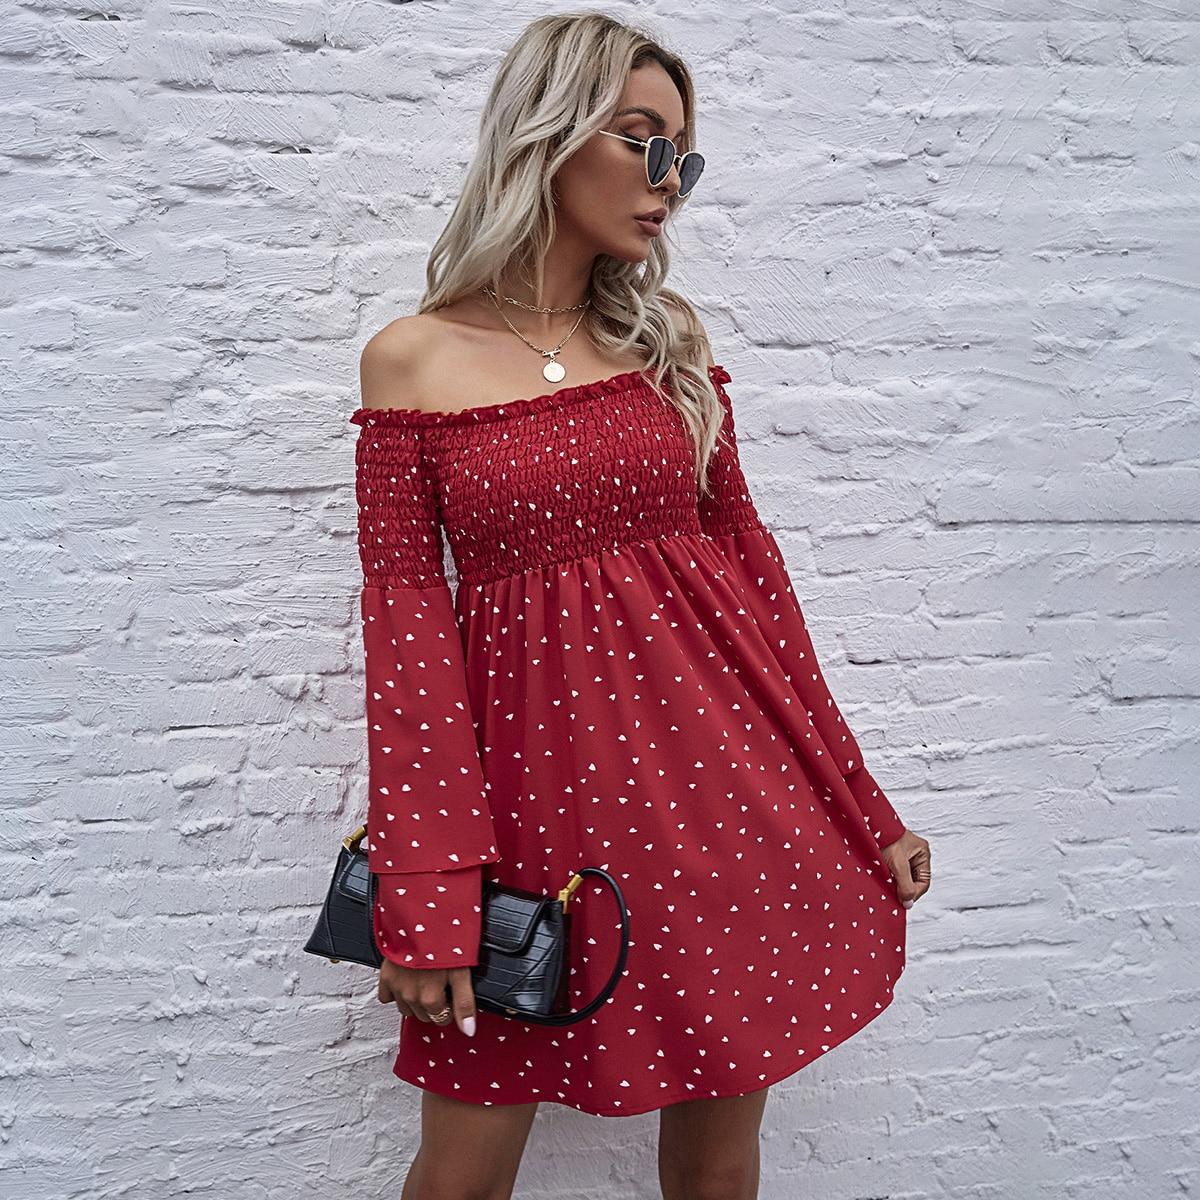 SHEIN / Off-shoulder Heart Print Shirred Dress